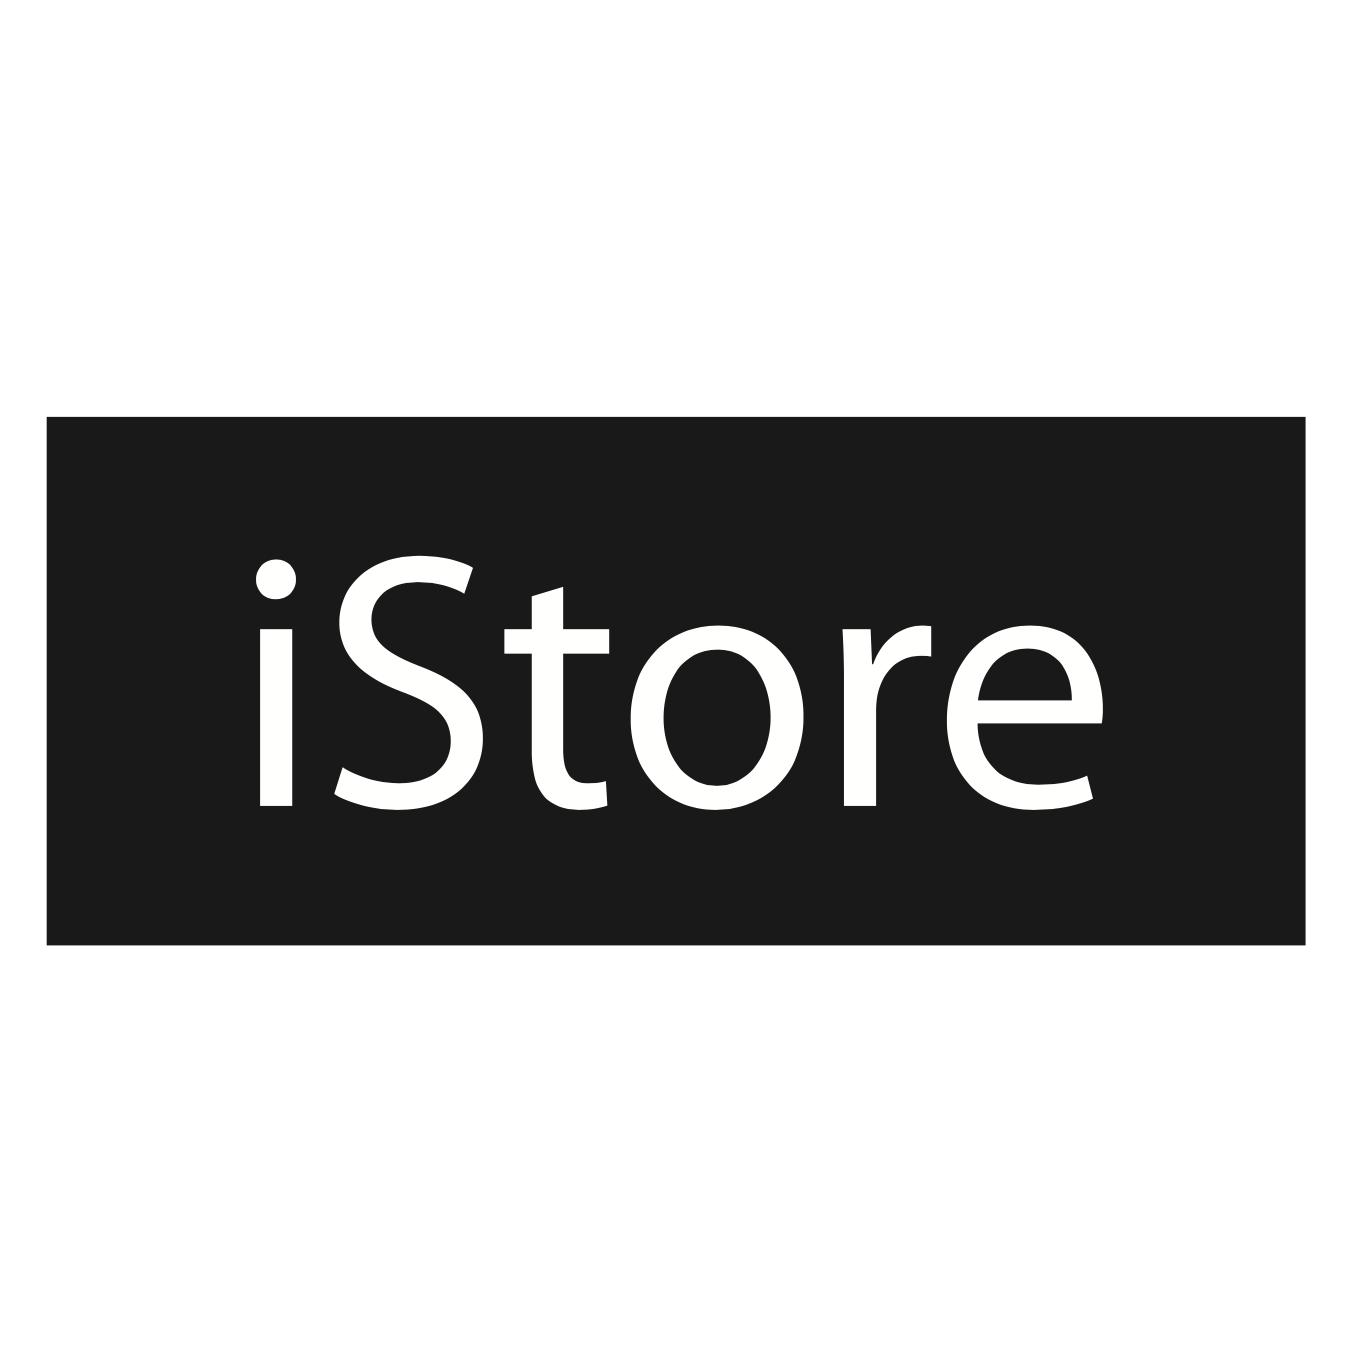 Griffin iPhone 6 Plus/ 6s Plus Identity Graphite Case - Black and White